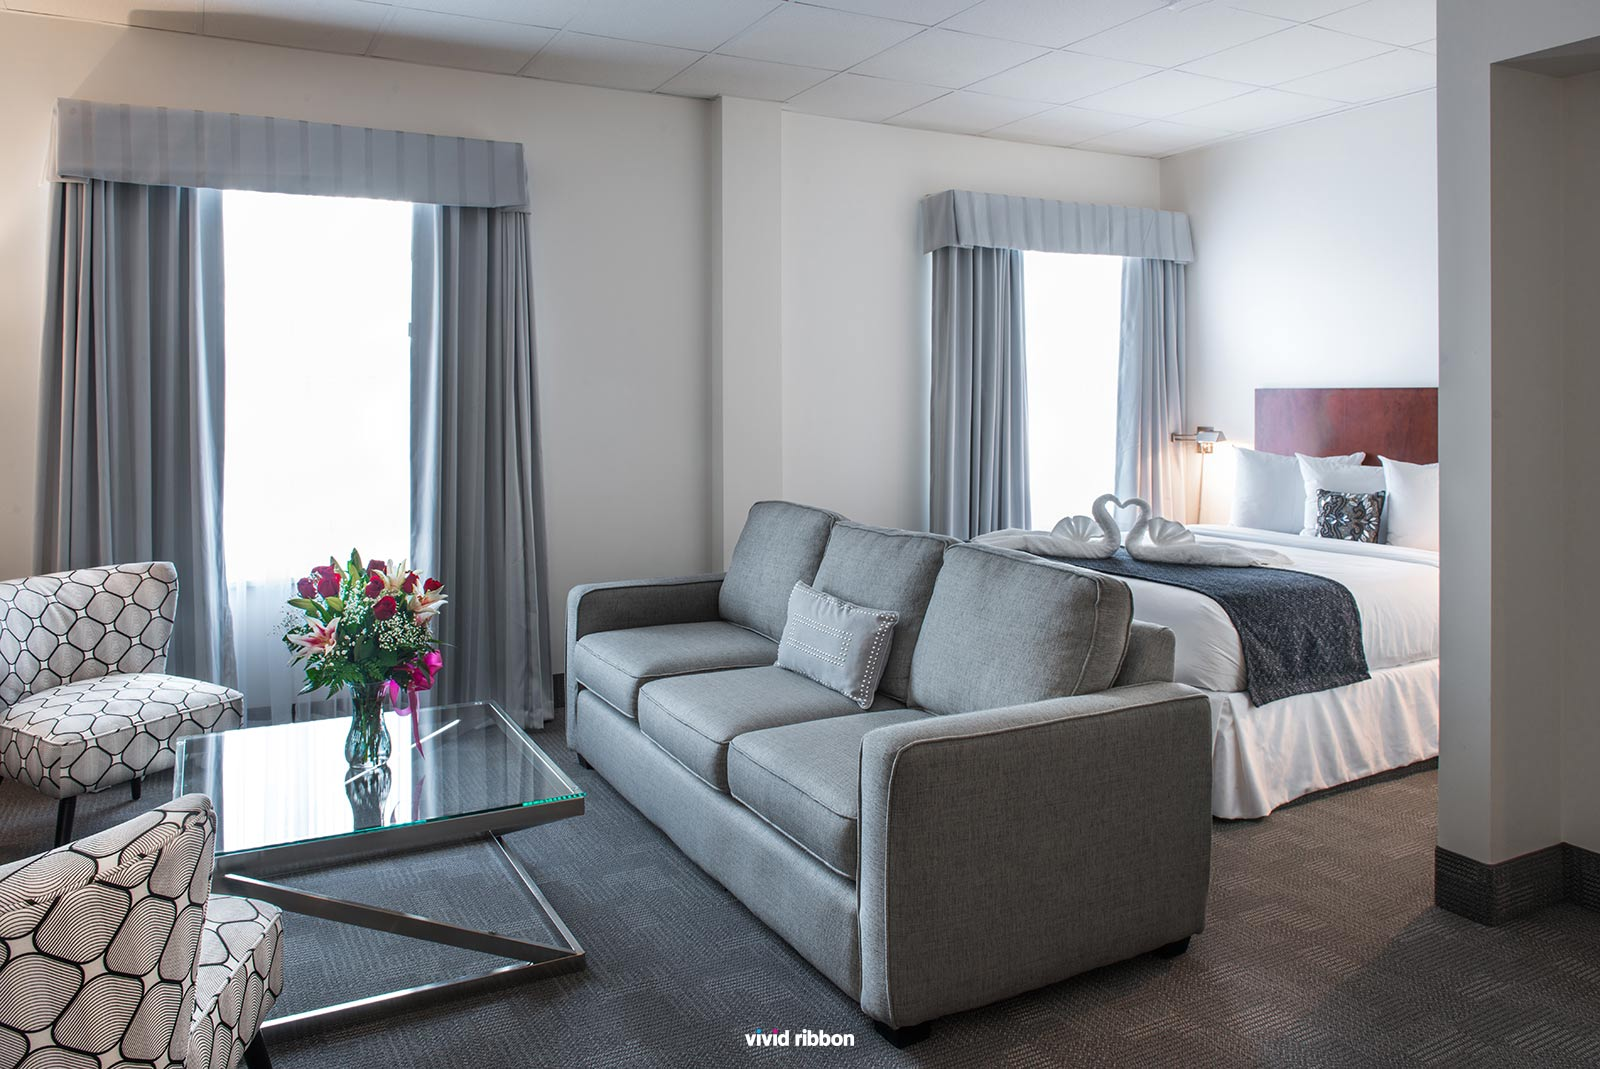 Park-Centre-Hotel-5779